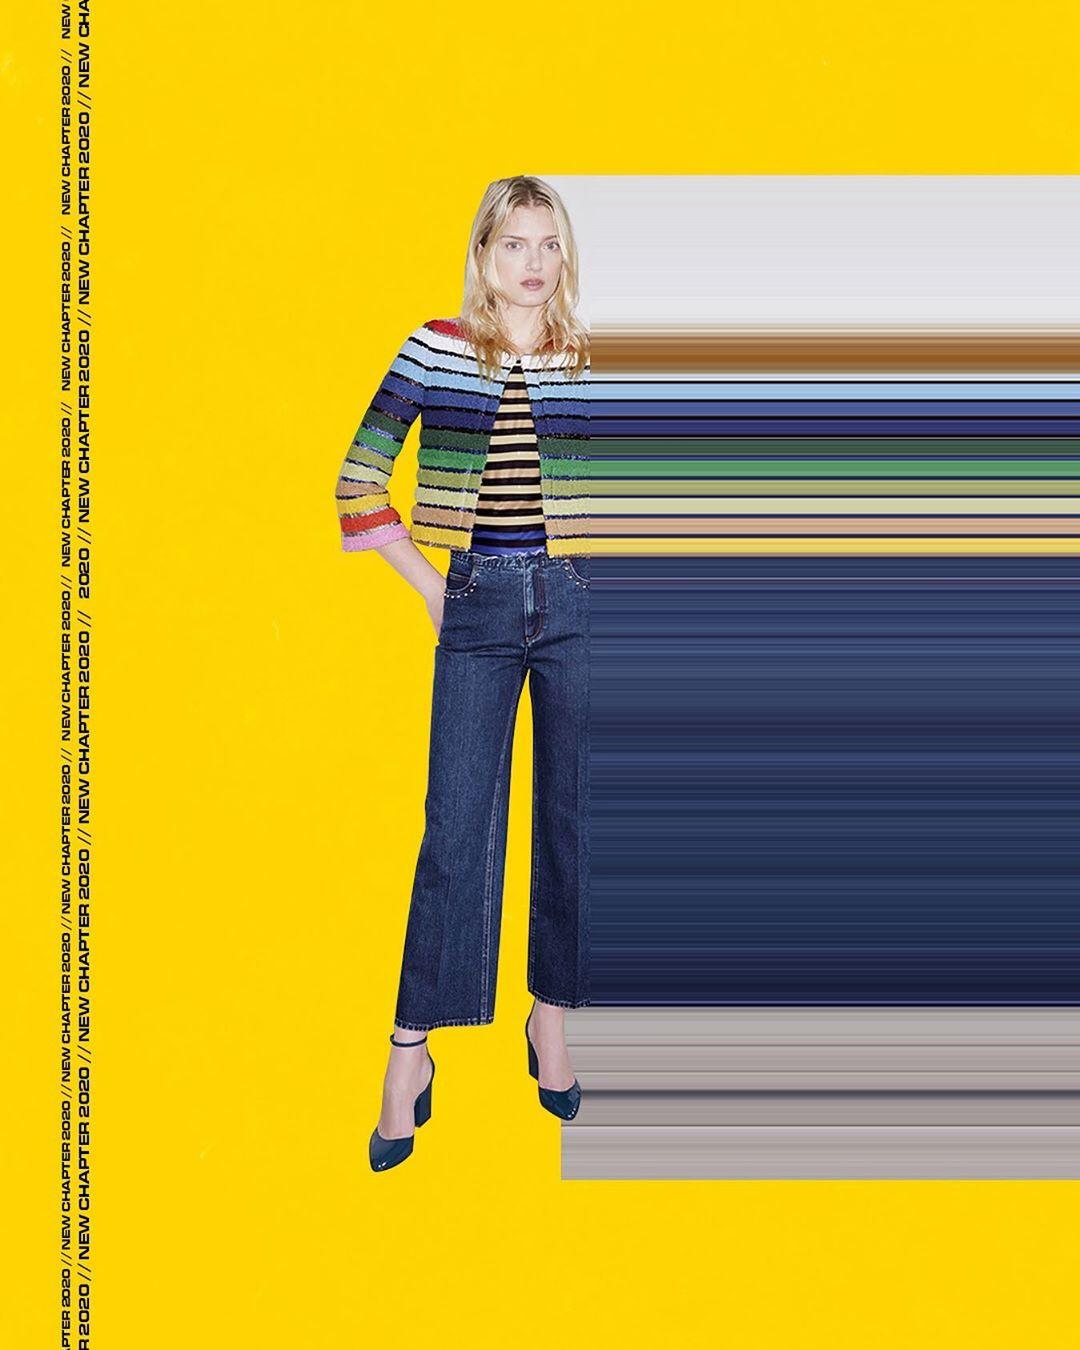 sonia rykiel business of fashion tiene nuevos dueños 5